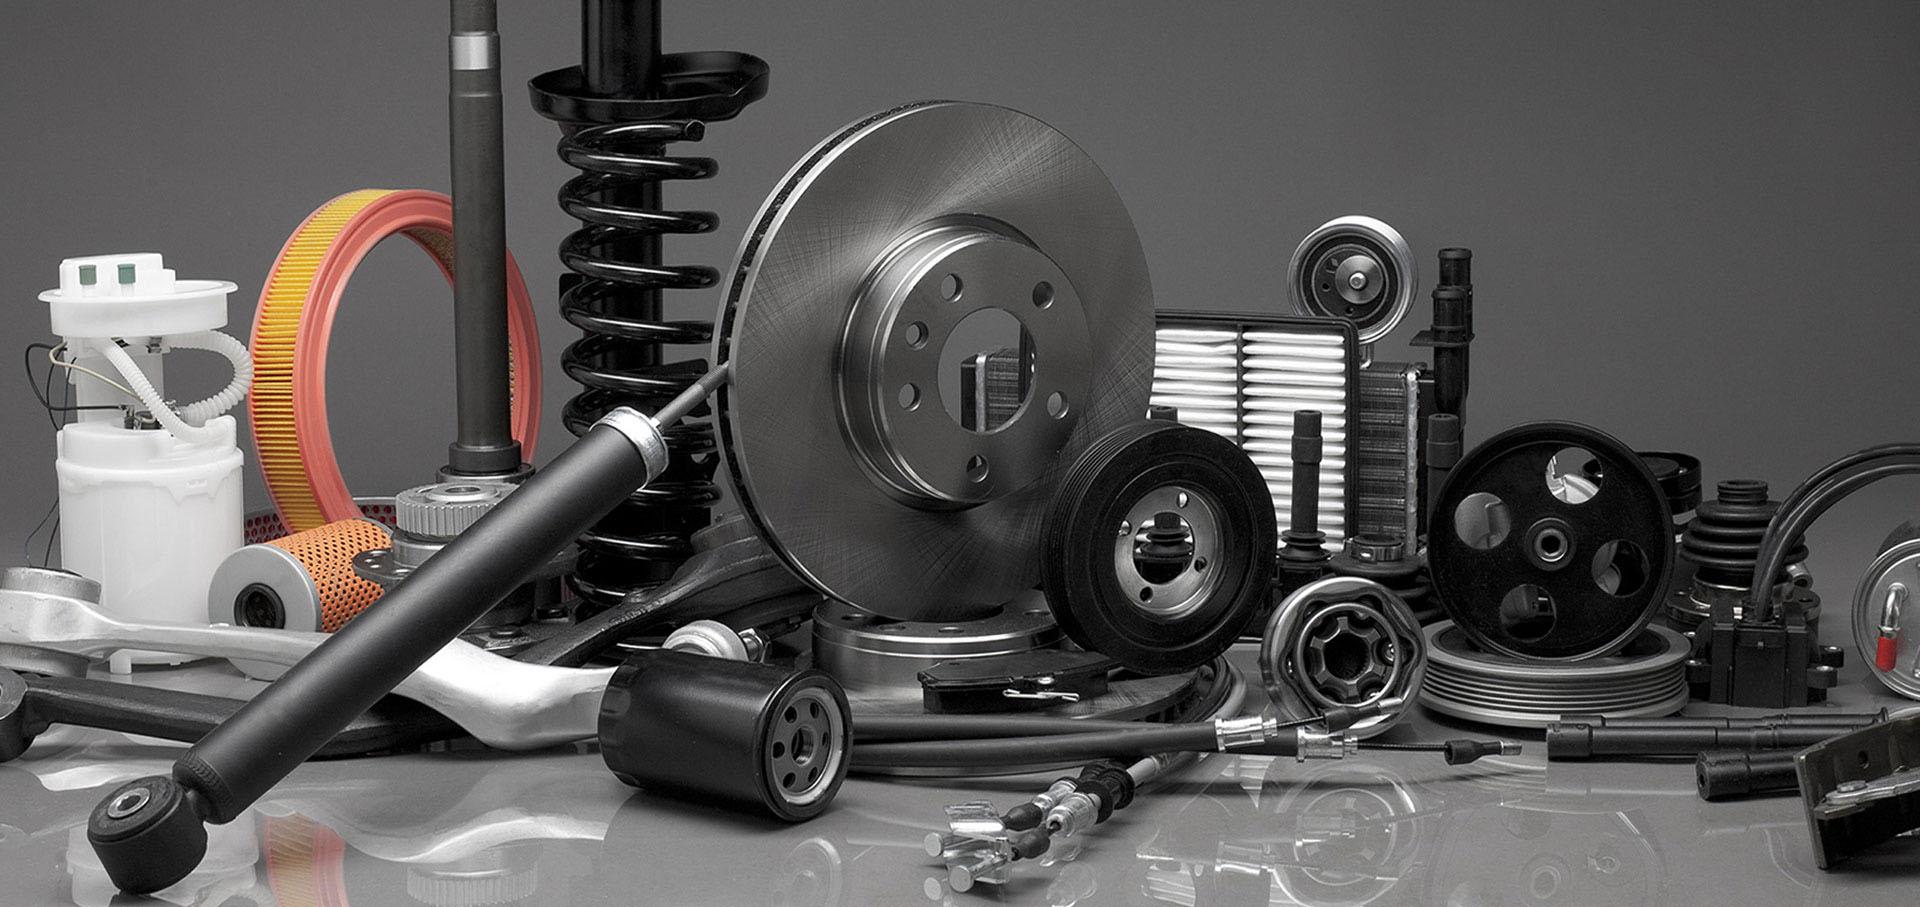 homepage slider 1 - kam auto parts braybrook